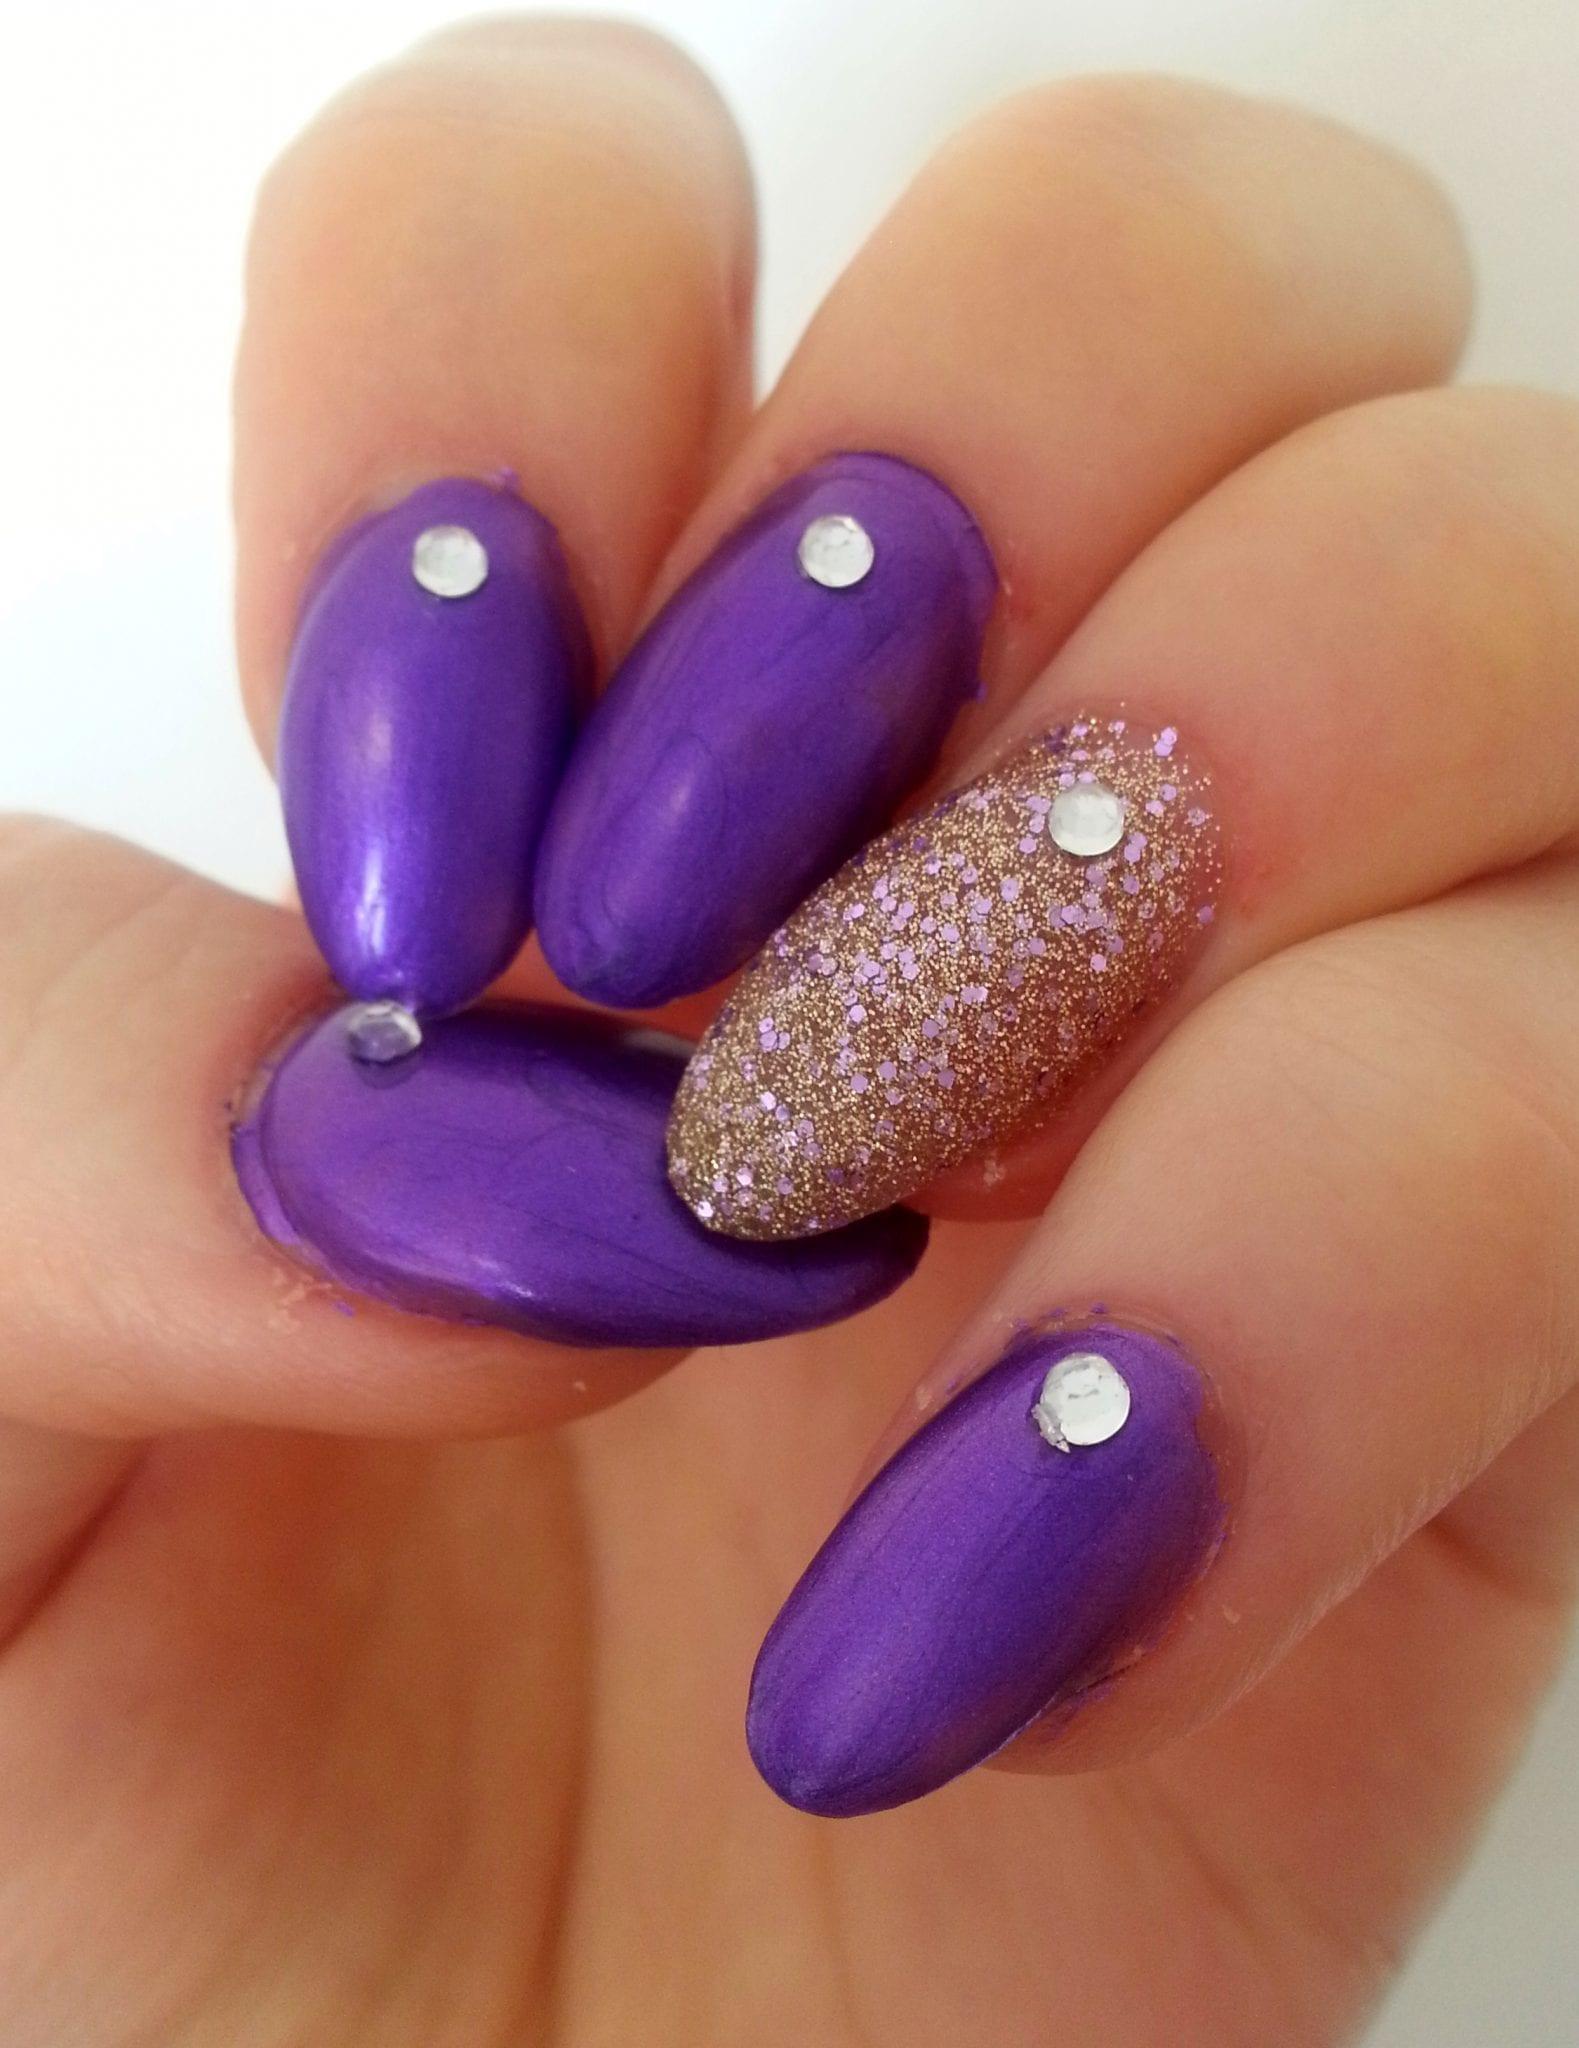 Fabulous nail art is for everyone | TrendLife Magazine